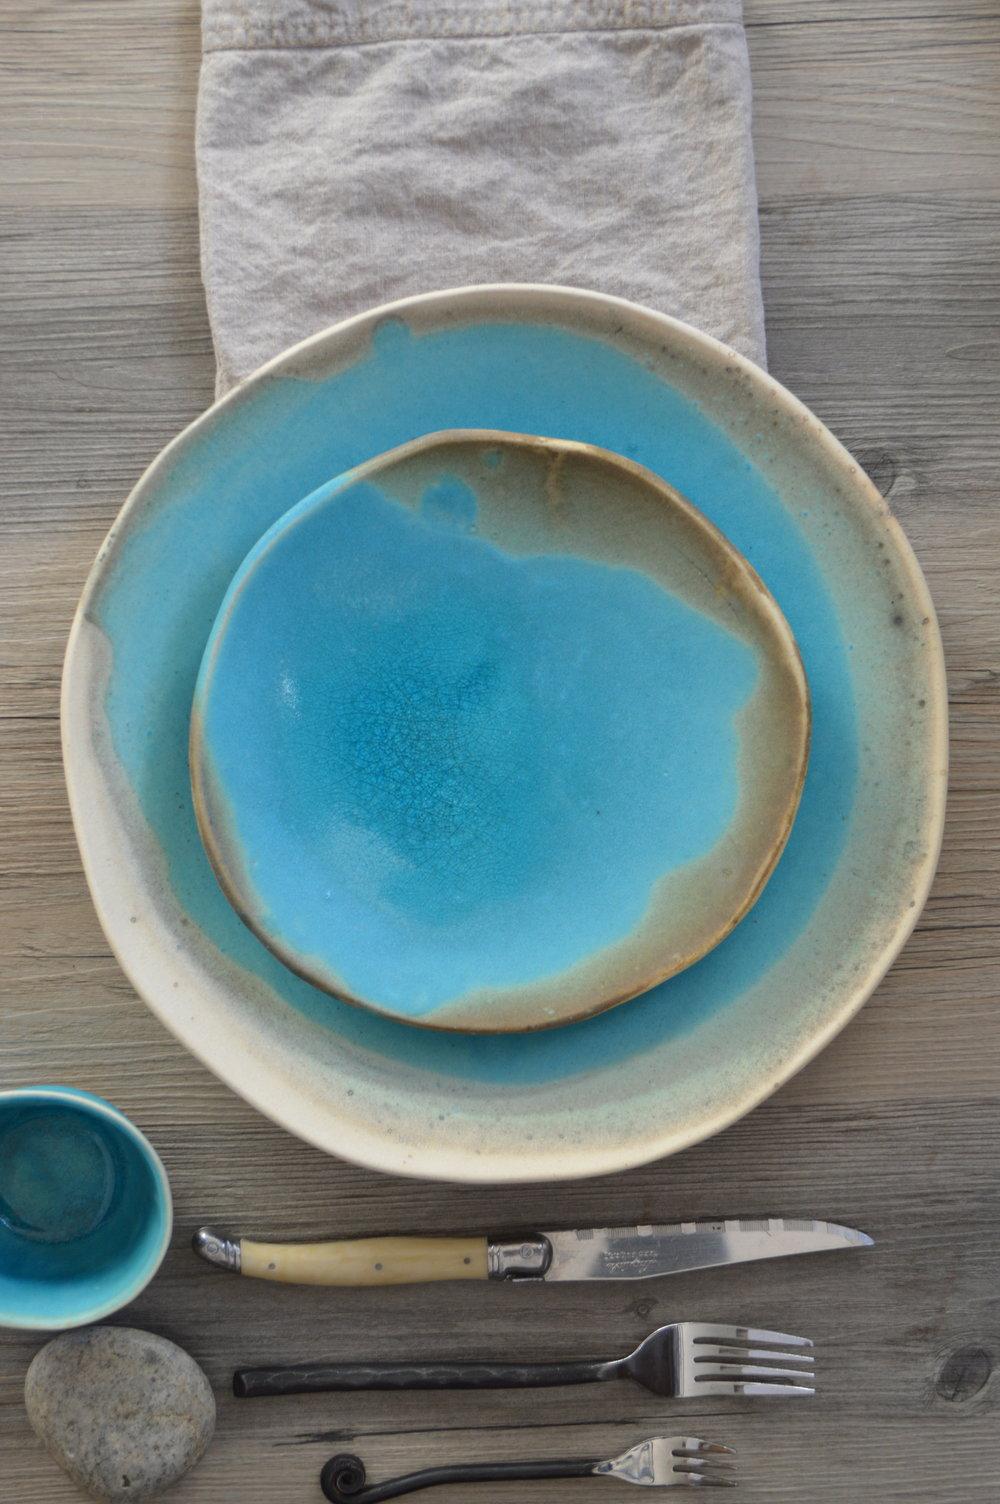 Ceramic dinner set in acqua - dinnerware set - turquoise & DSC_0038.JPG?format\u003d500w